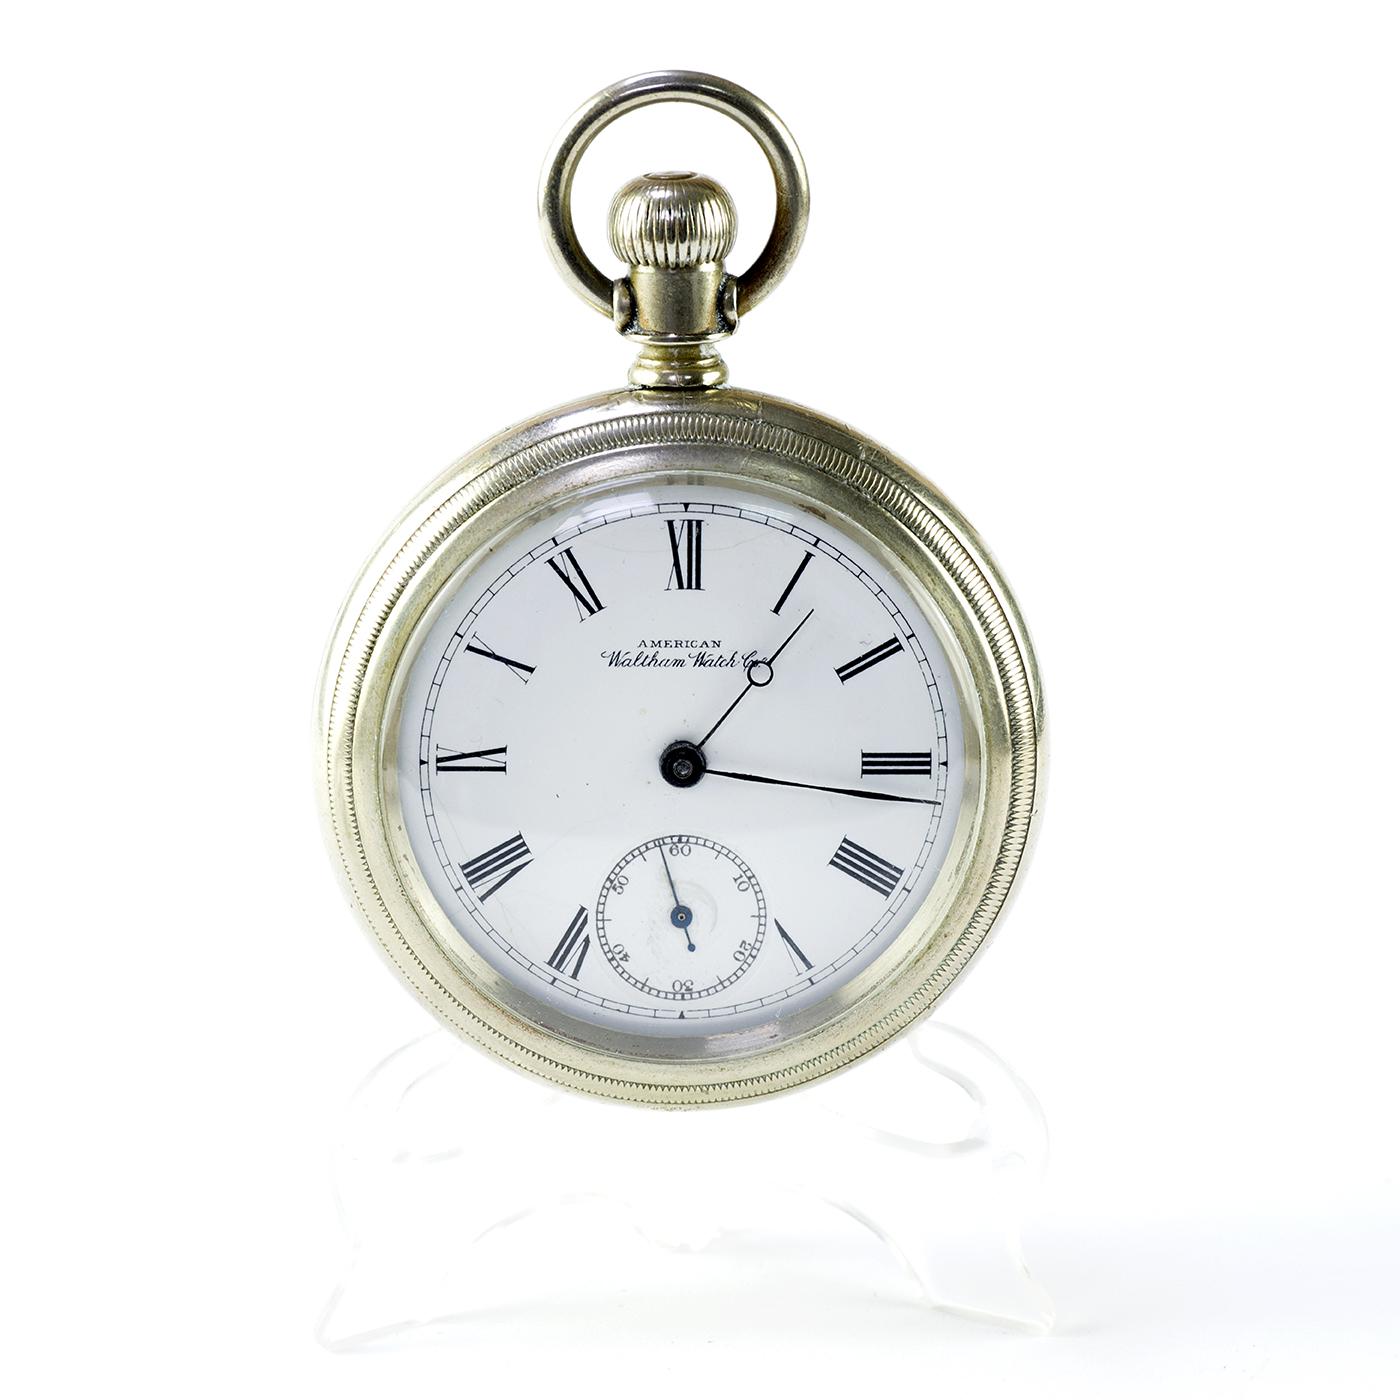 AMERICAN WALTHAM WATCH CO.(USA). Reloj de Bolsillo, Lepine y remontoir. USA, ca.1890.